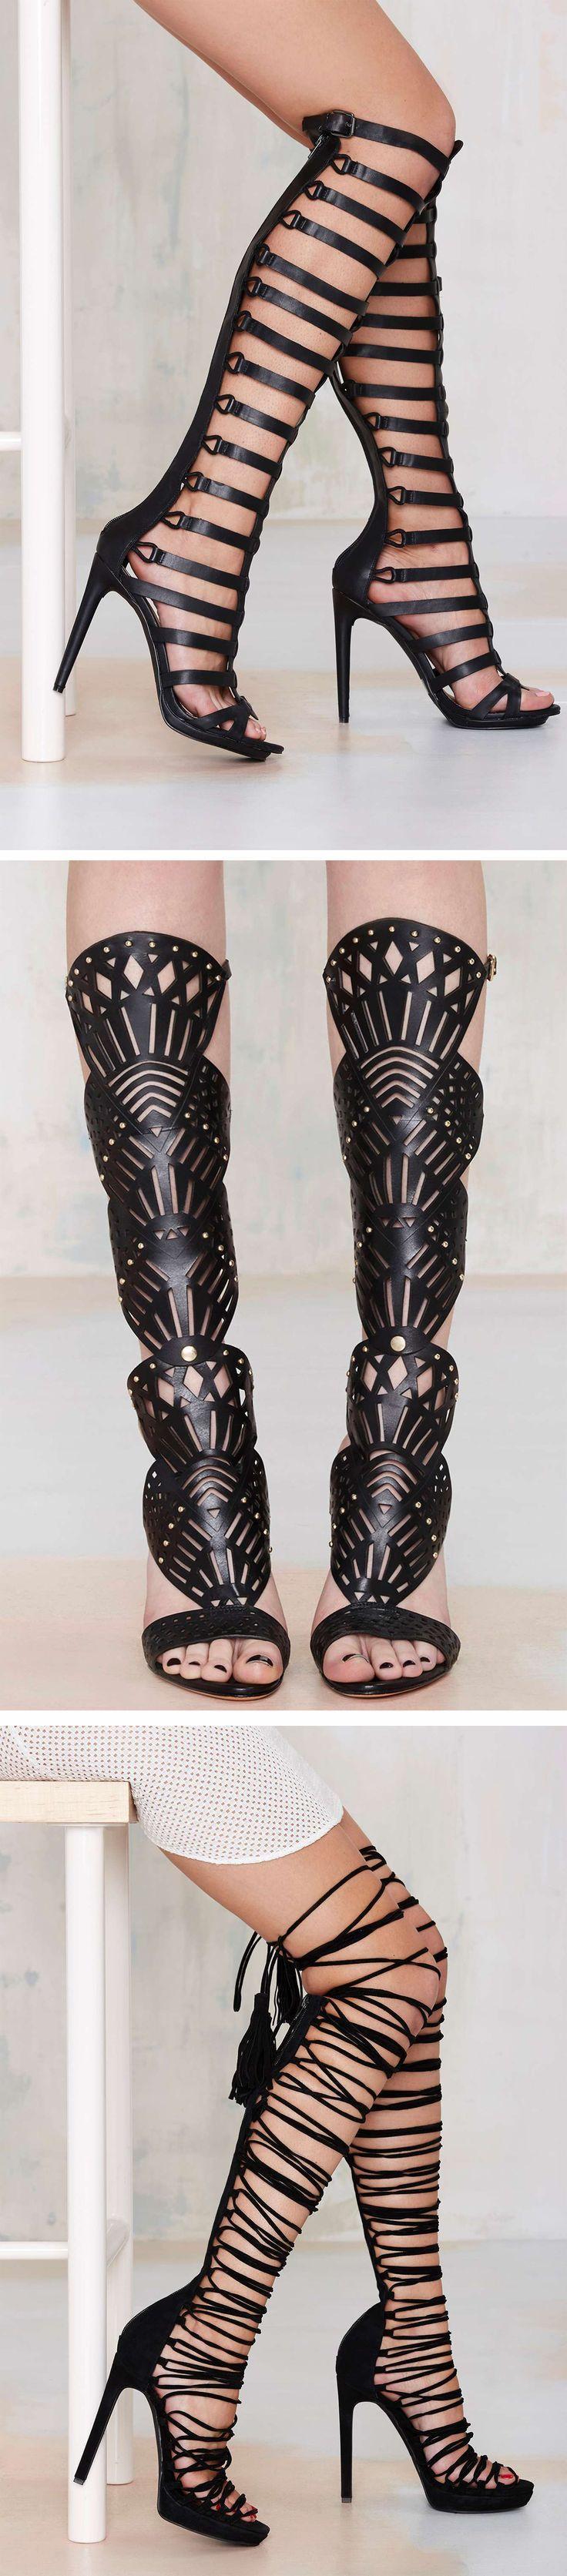 Wedding - Gladiator Sandals